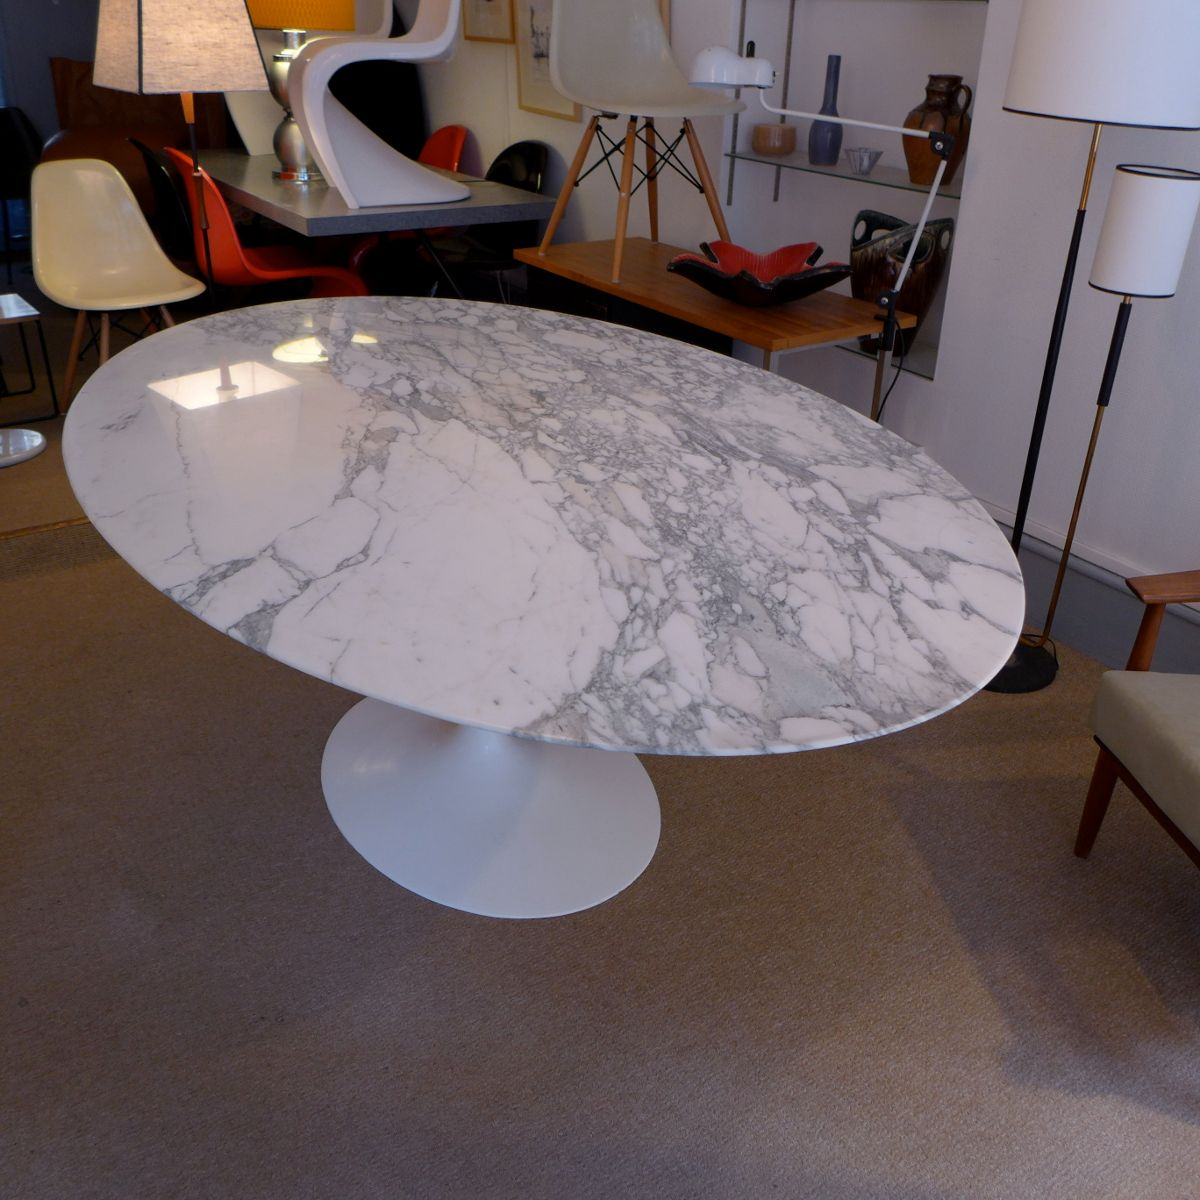 Table de salle manger ovale en marbre par eero saarinen for Table de salle a manger knoll